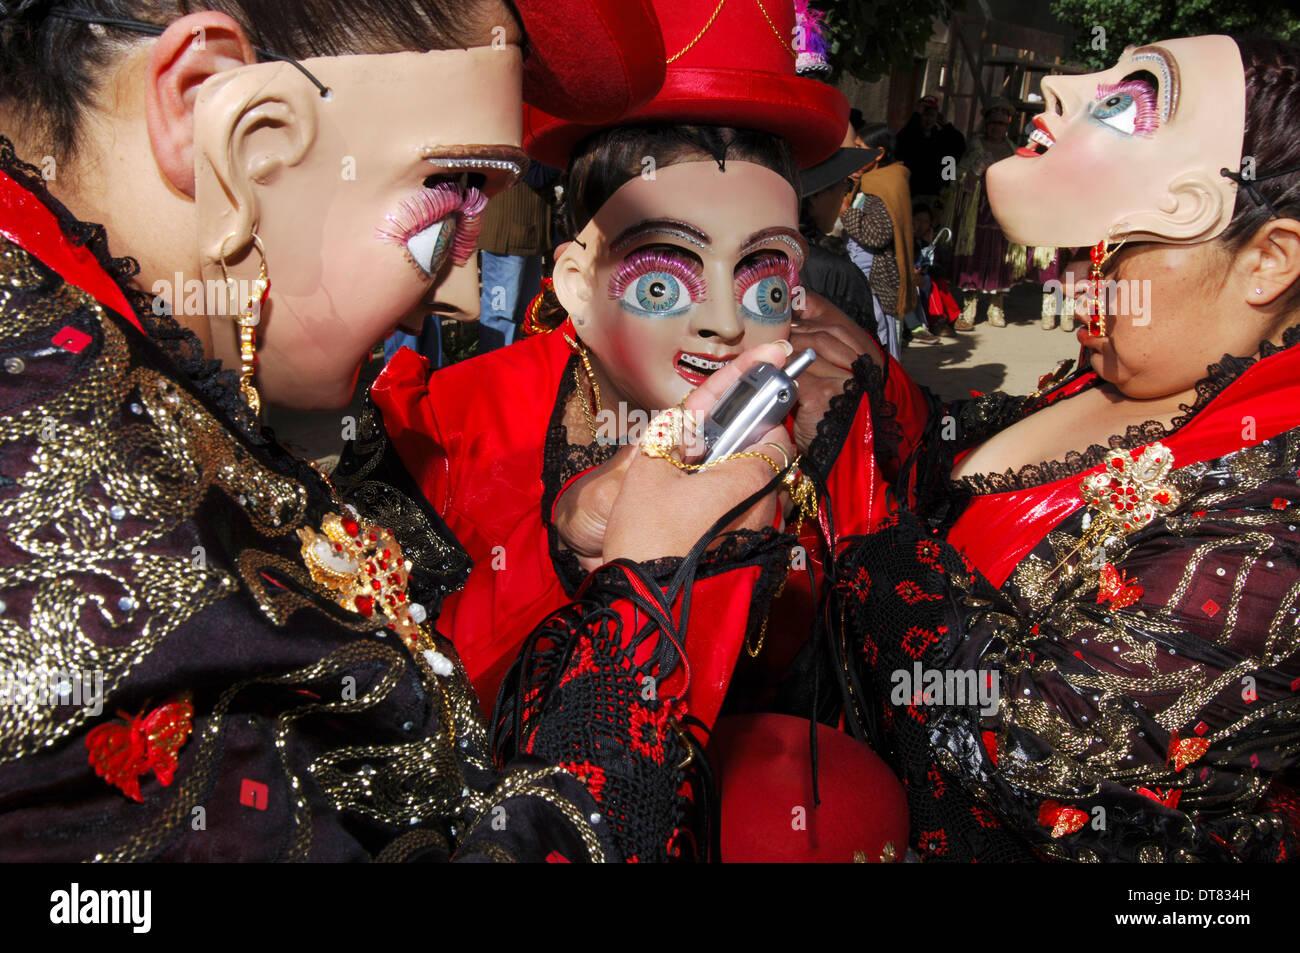 oruro asian personals Karina 40 yo bolivian woman karina seeking man 40-50 for marriage or long time relationship view all bolivian brides free profiles of bolivian brides, girls, single bolivian women seeking men online for love, bolivian dating, romance and marriage.